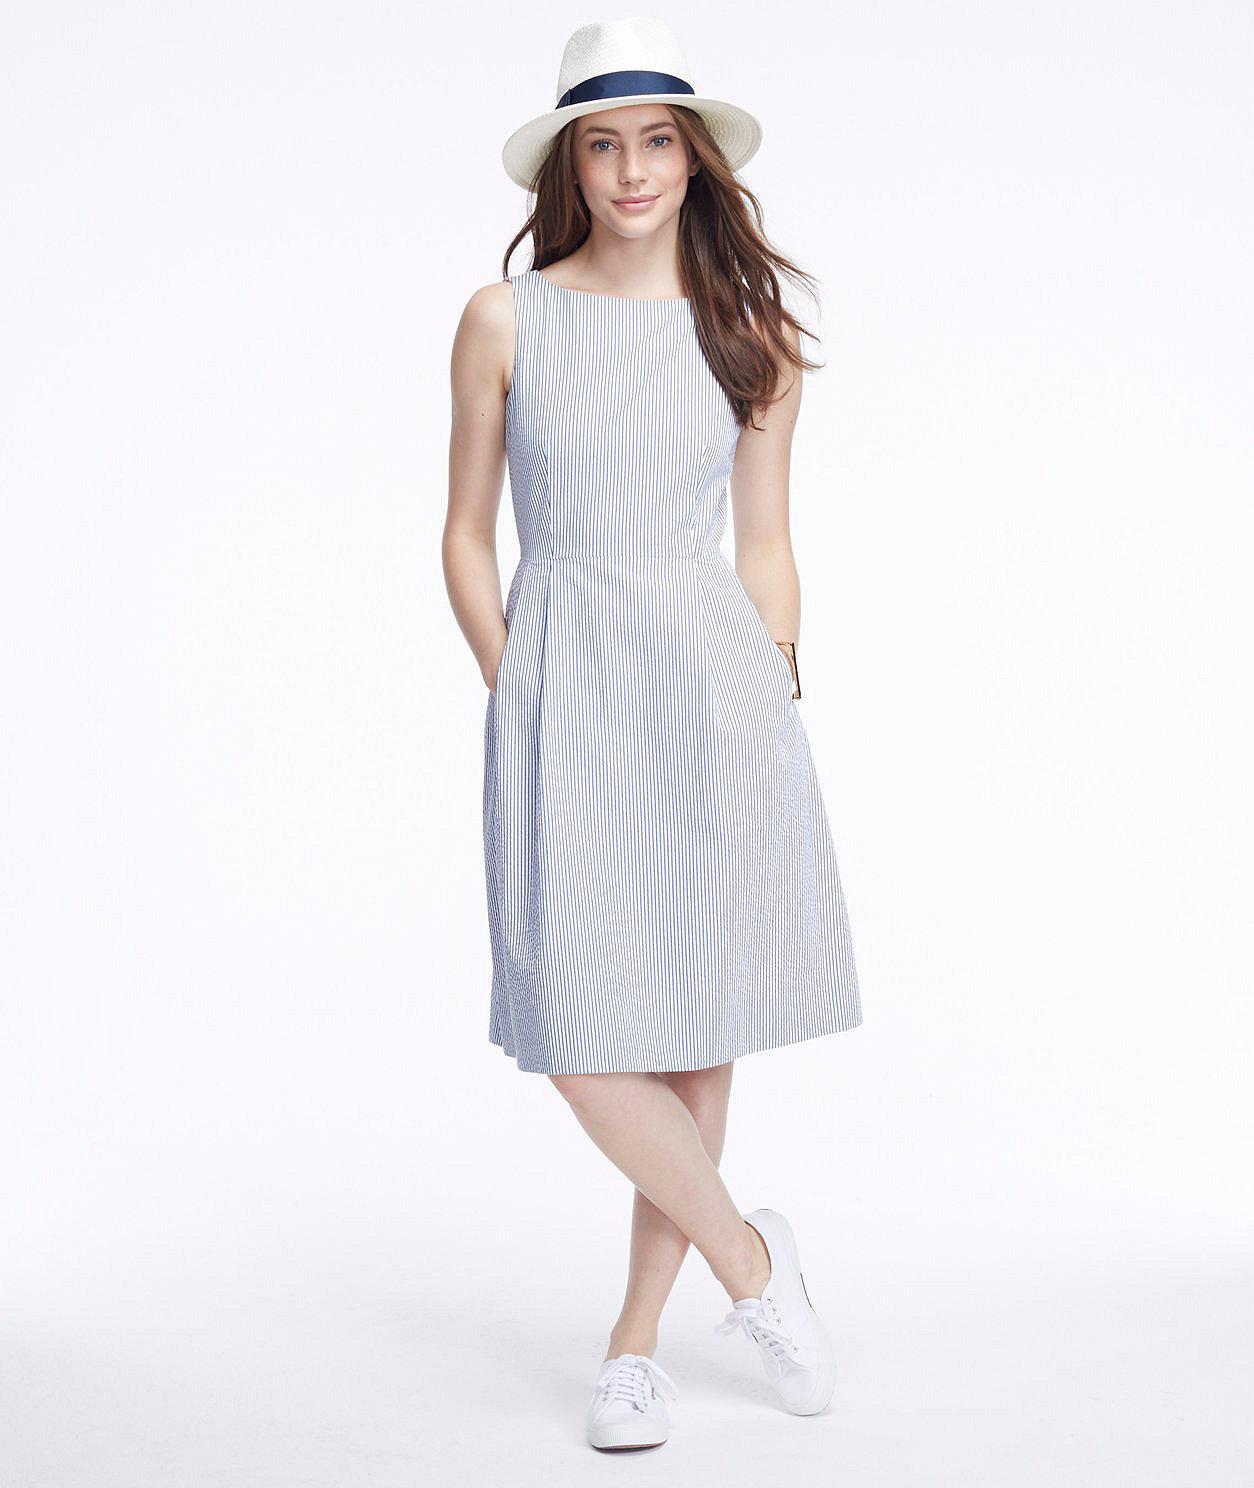 Women's Signature Seersucker Dress, Stripe | Free Shipping at L.L.Bean